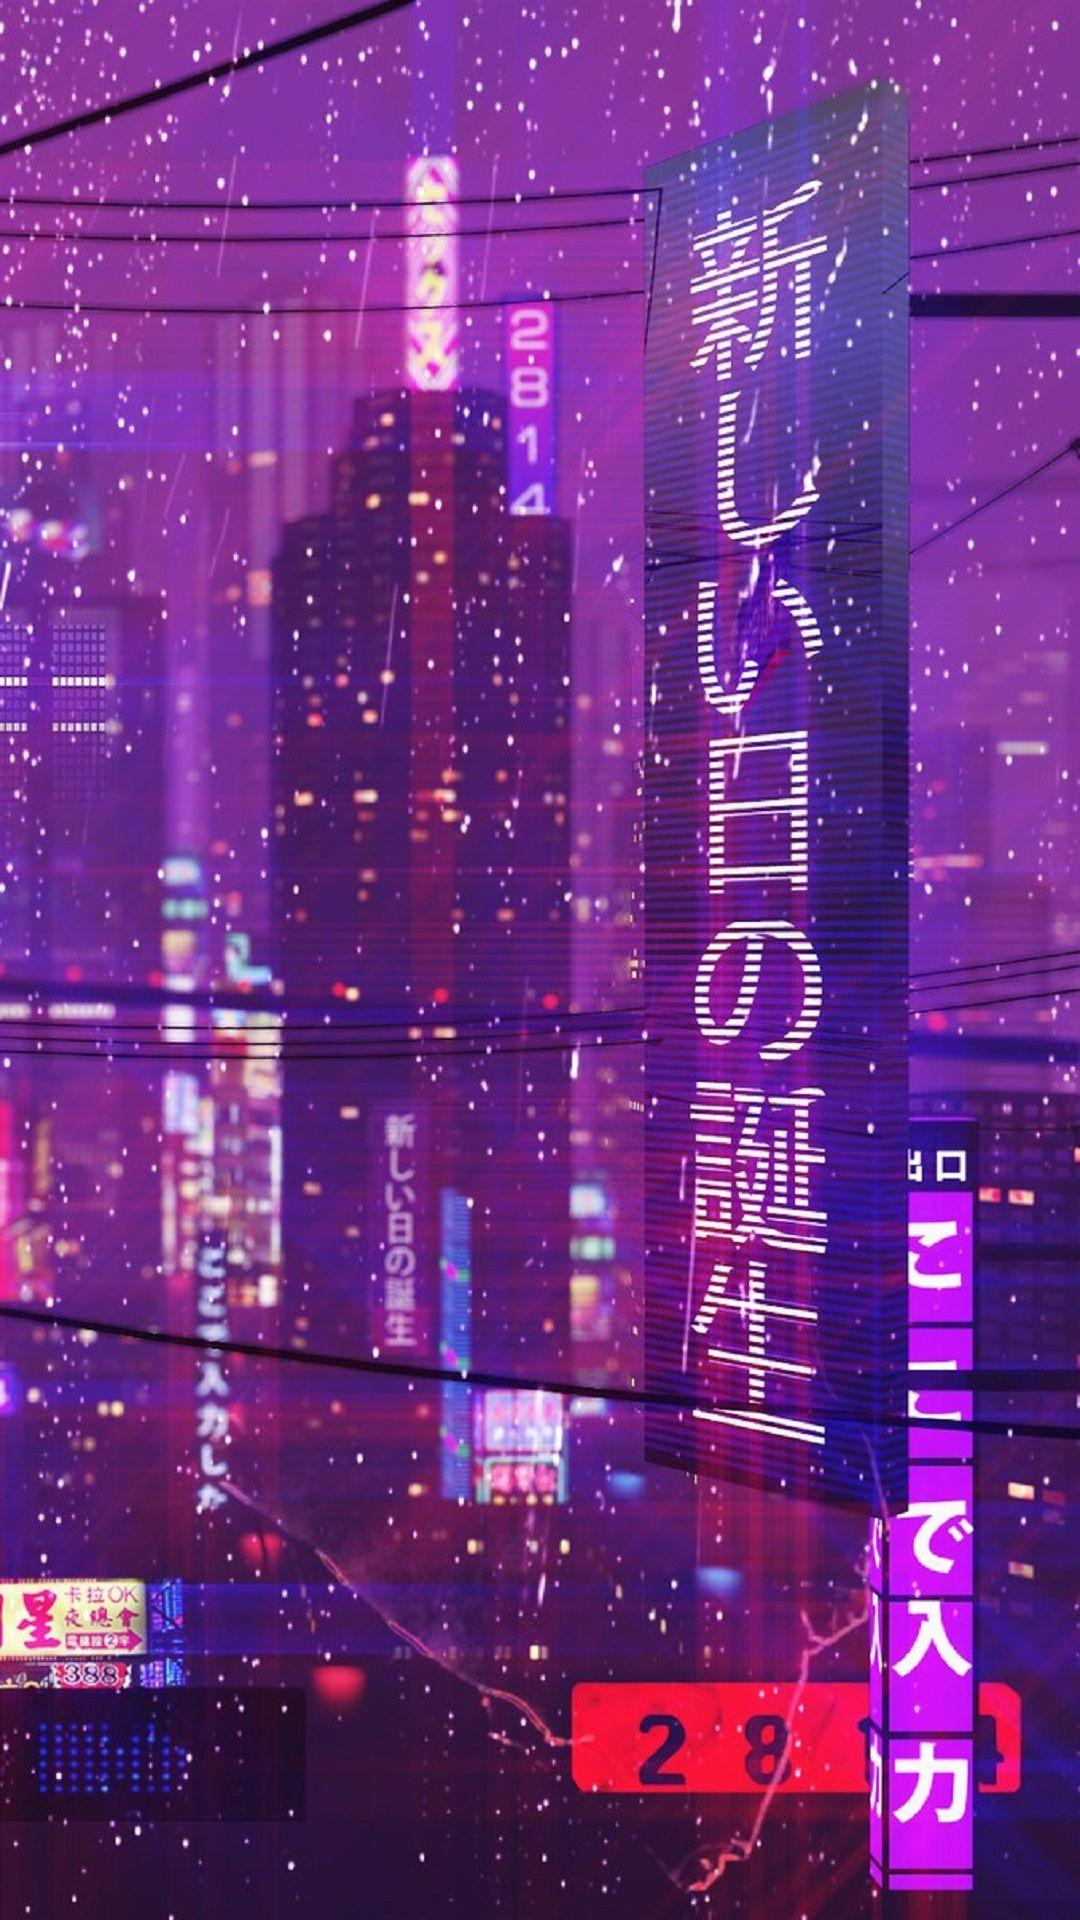 Çyber Füture in 2020 Vaporwave wallpaper, Wallpaper